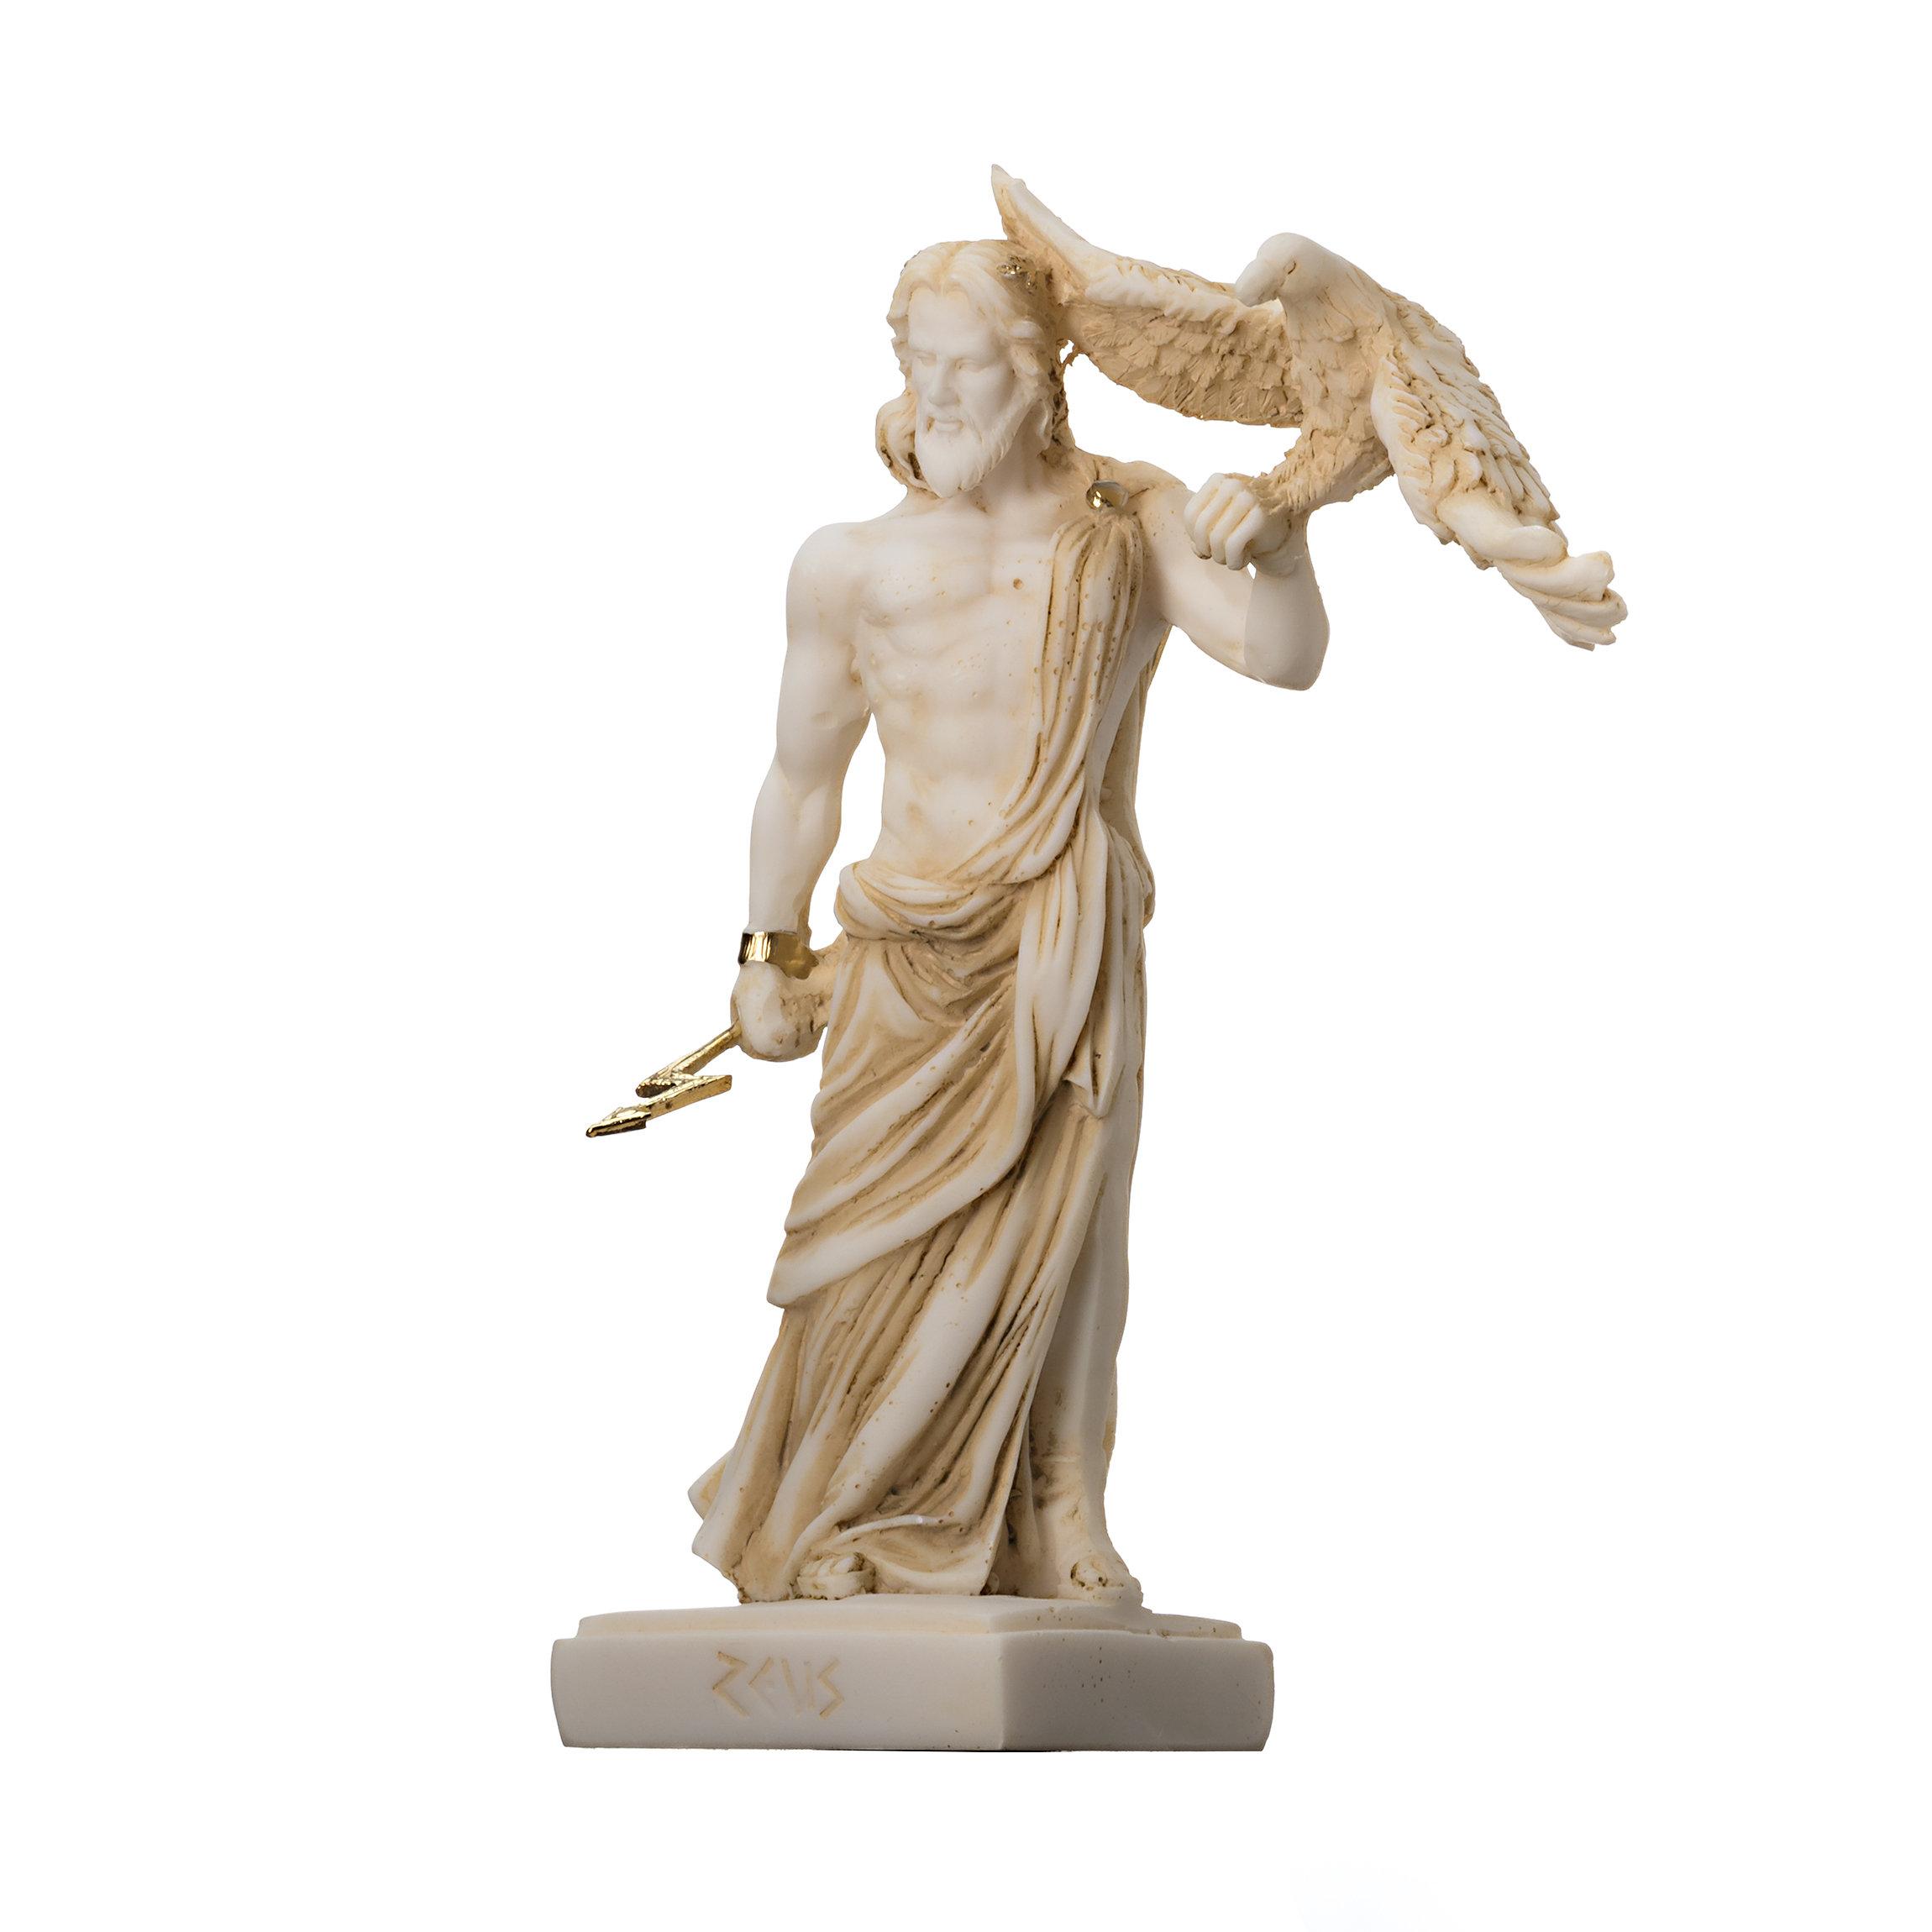 Virgin Mary Sculpture Marble Greek Handmade Religious Statue 16cm